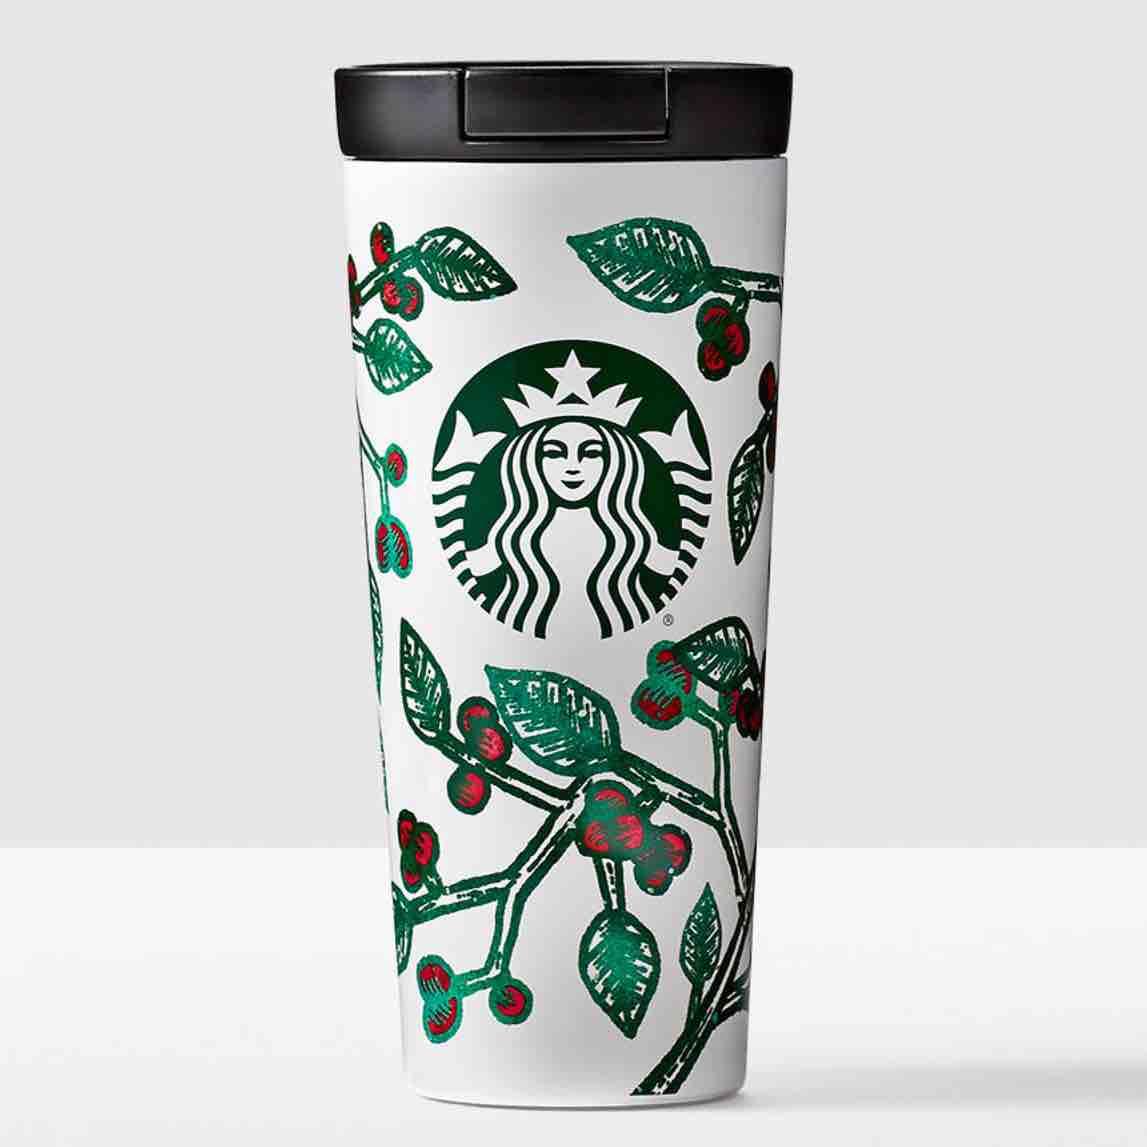 Free Tea At Starbucks 7/14!!! - Printable Coupons And Deals - Free Starbucks Coupon Printable